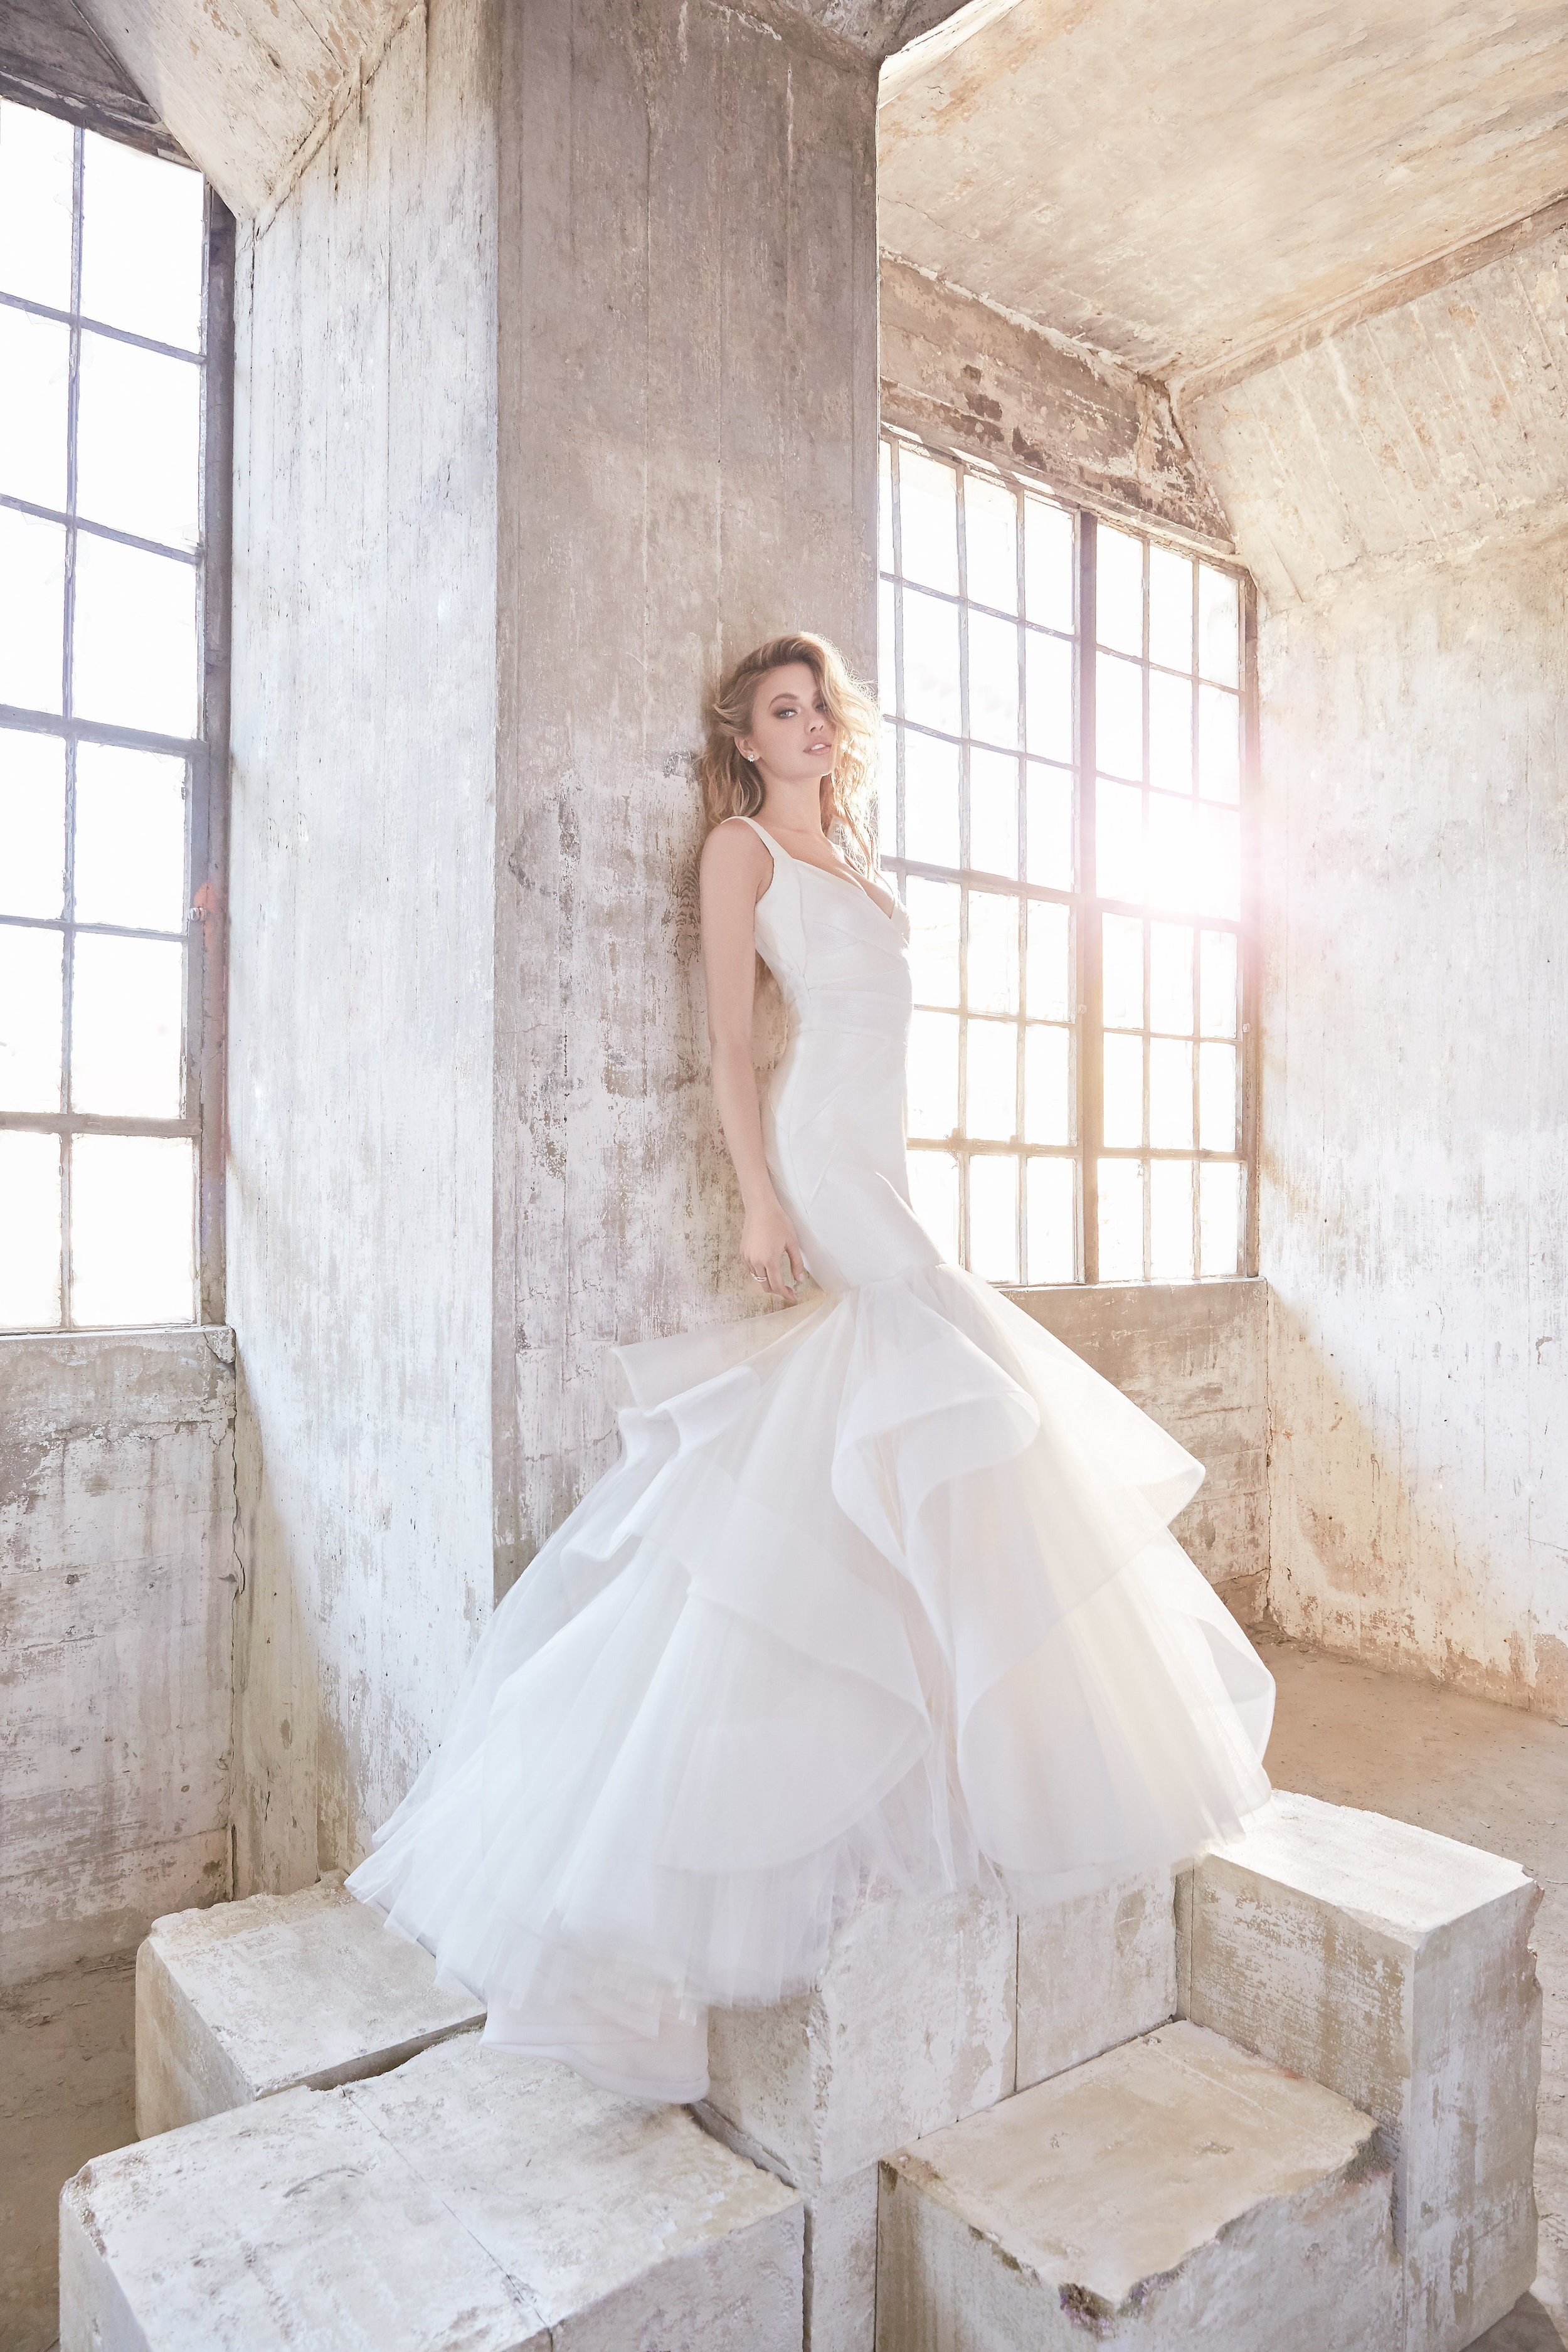 hayley-paige-bridal-spring-2018-style-6802-glazer_9.jpg